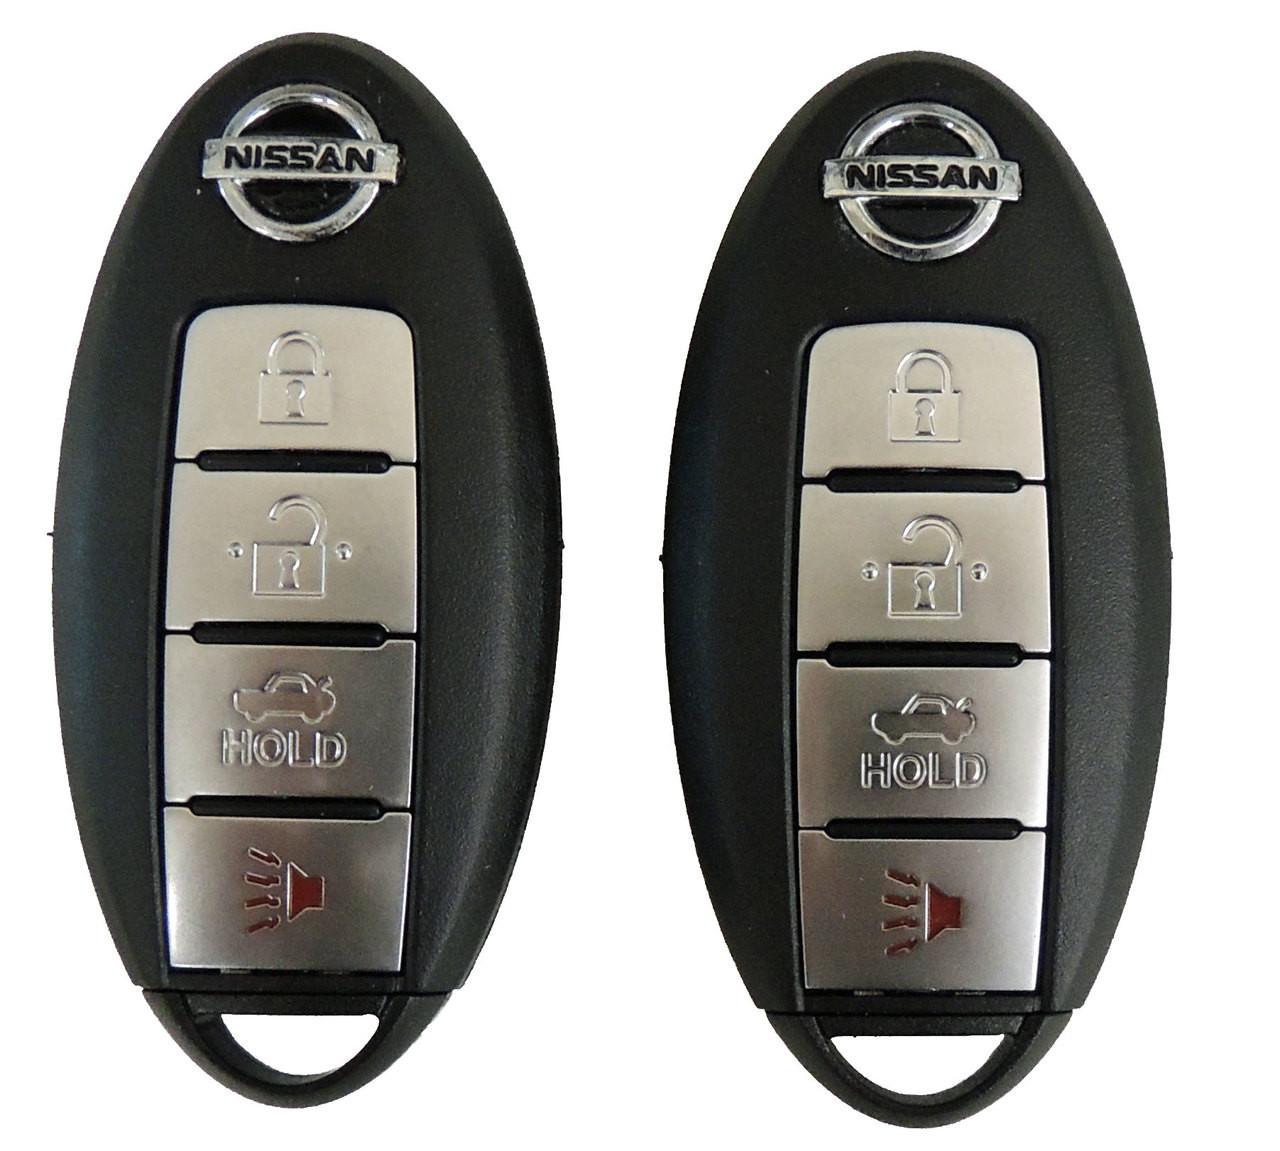 Nissan Intelligent Key >> 2 Keyless Entry Remote Smart Keys For Nissan Altima And Maxima Intelligent Key Kr55wk48903